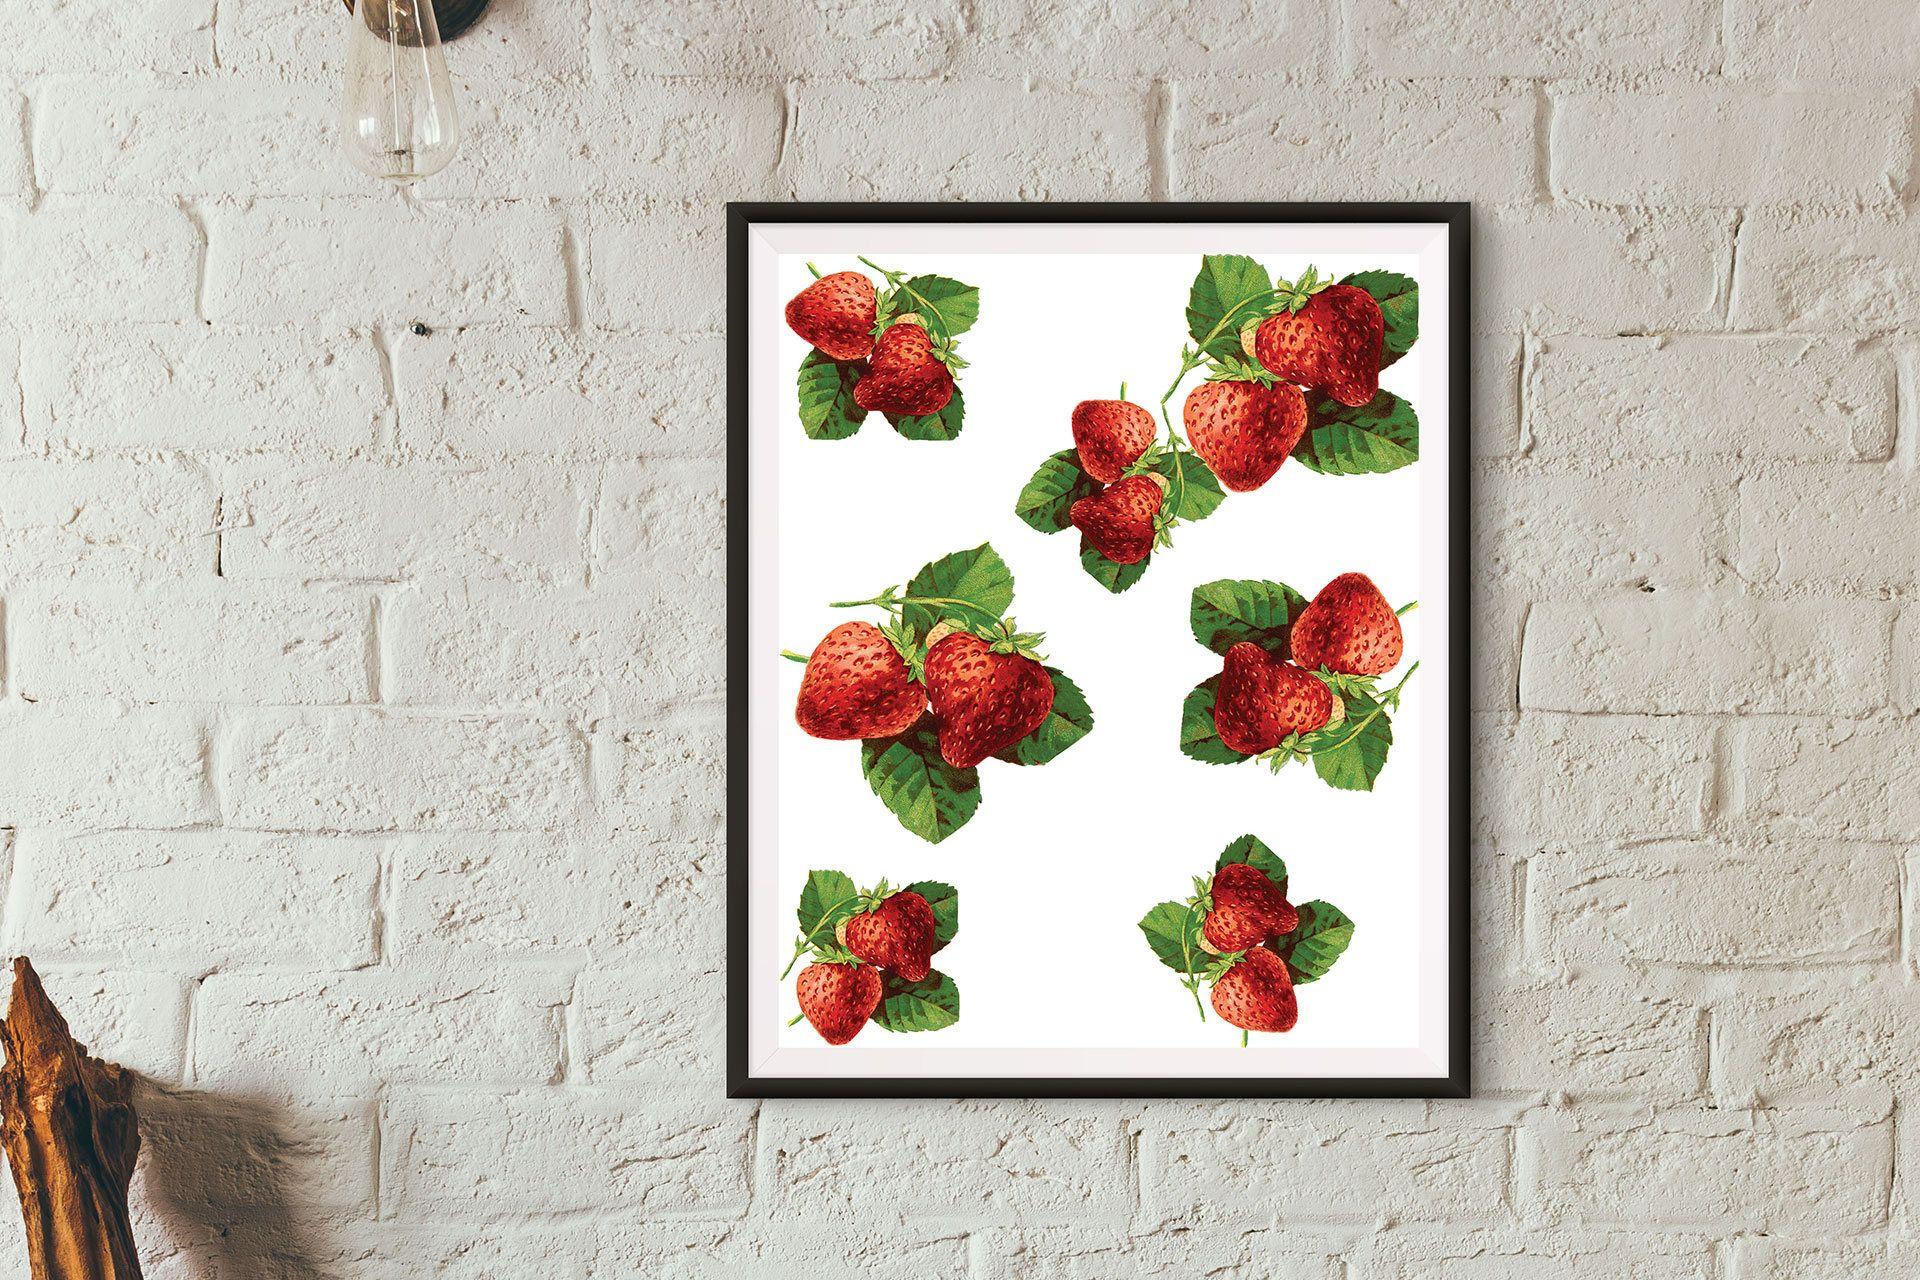 Strawberry printkitchen wall artfruit printfood art print